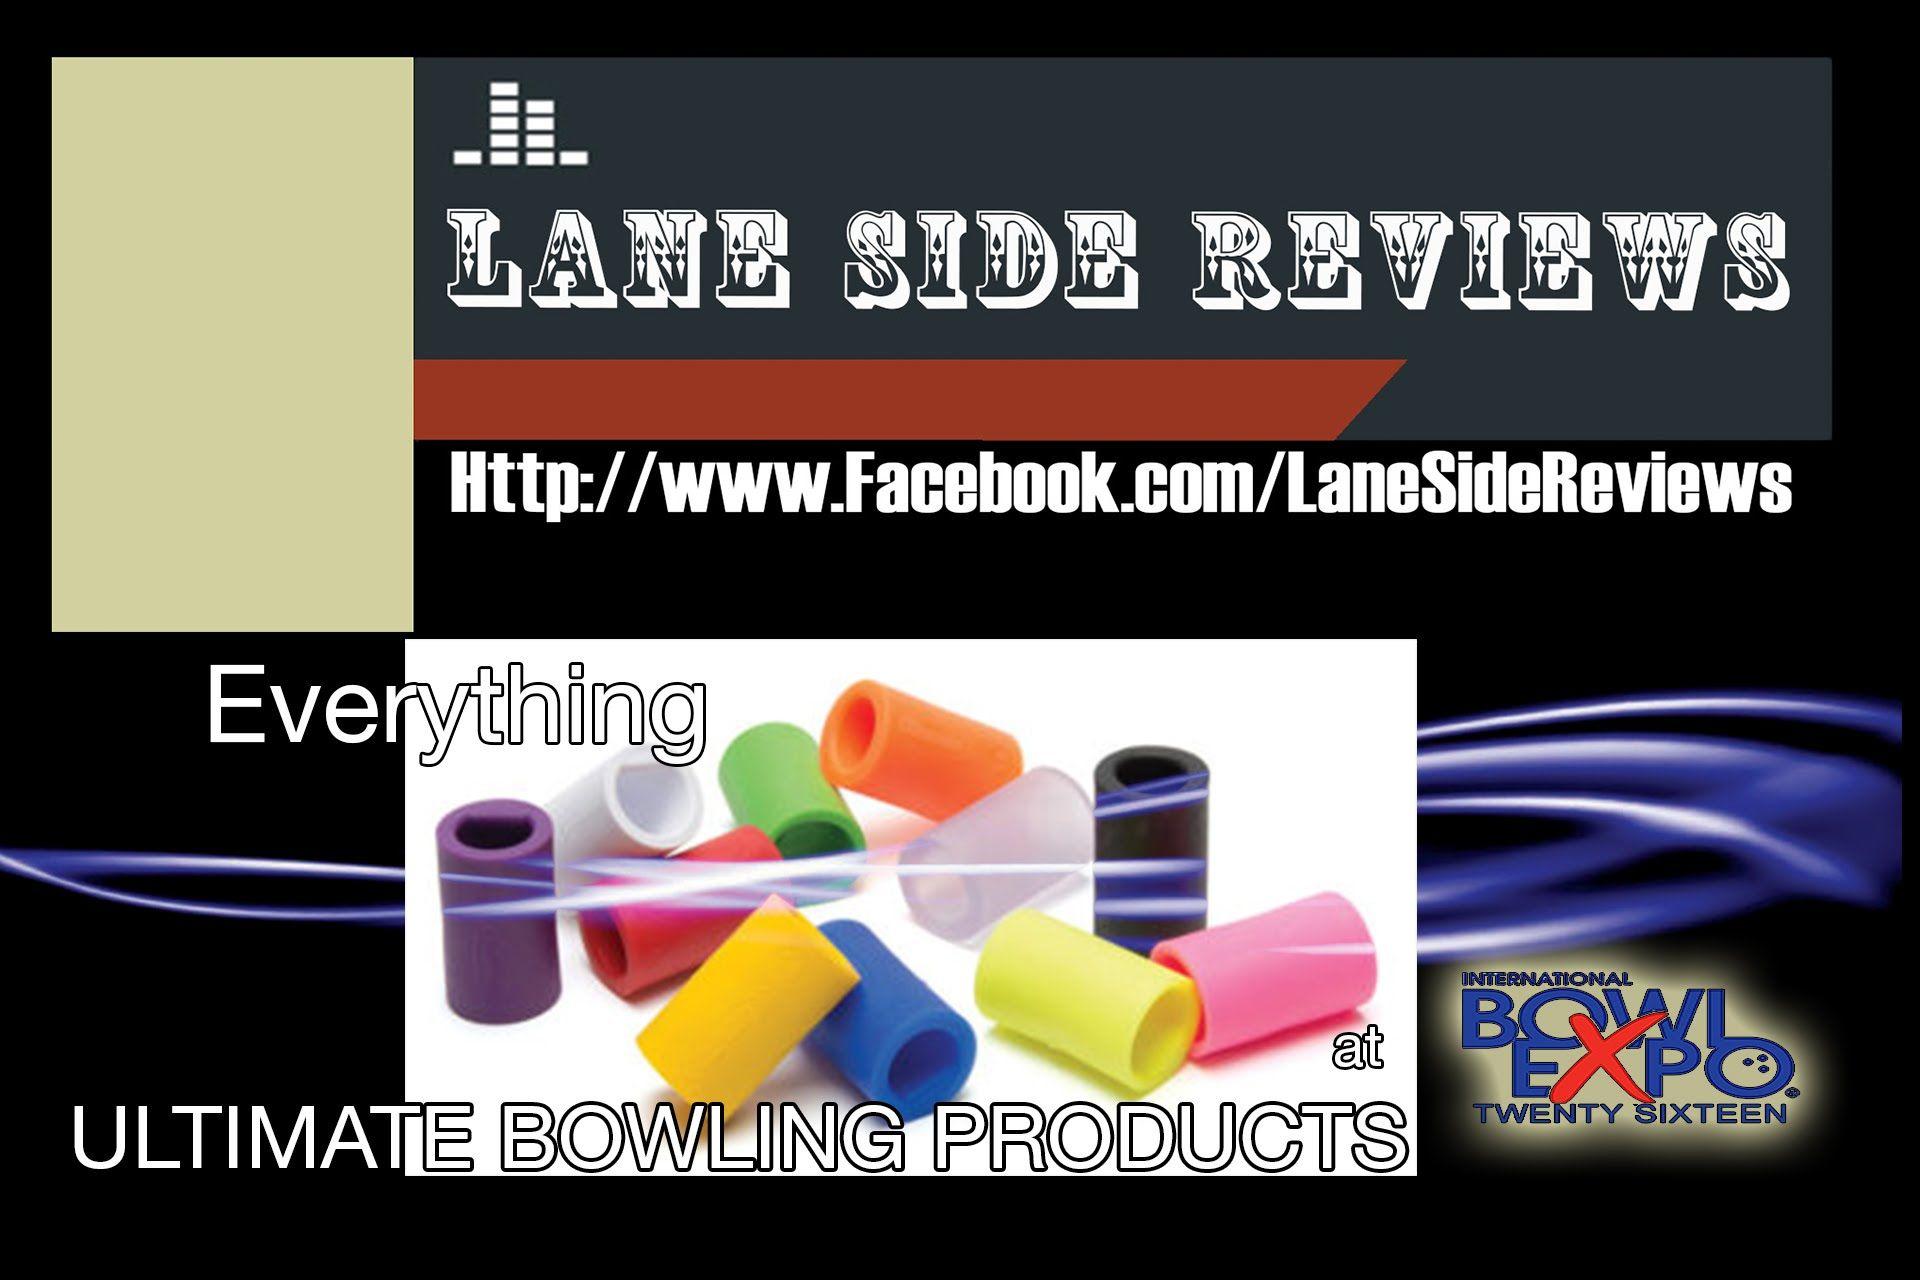 Everything Ultimate Bowling At Bowl Expo 2016 Https Www Youtube Com Watch V Jrtusqrlsge Bowling Bowling Ball Bowling Balls